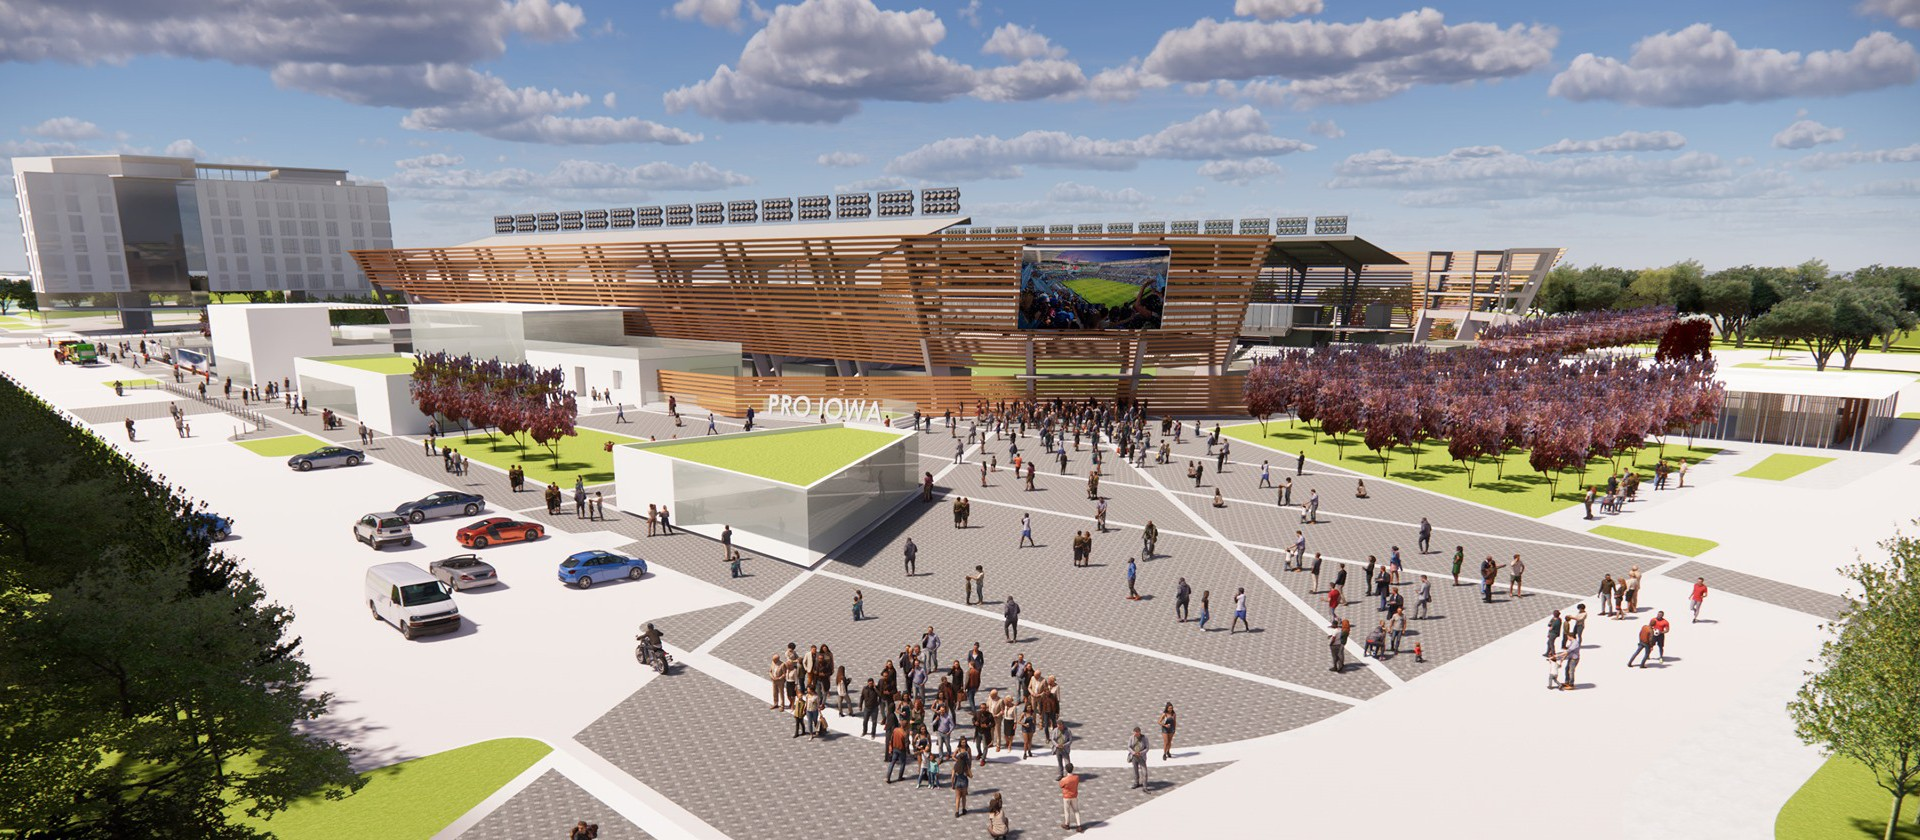 Pro Iowa USL stadium plan